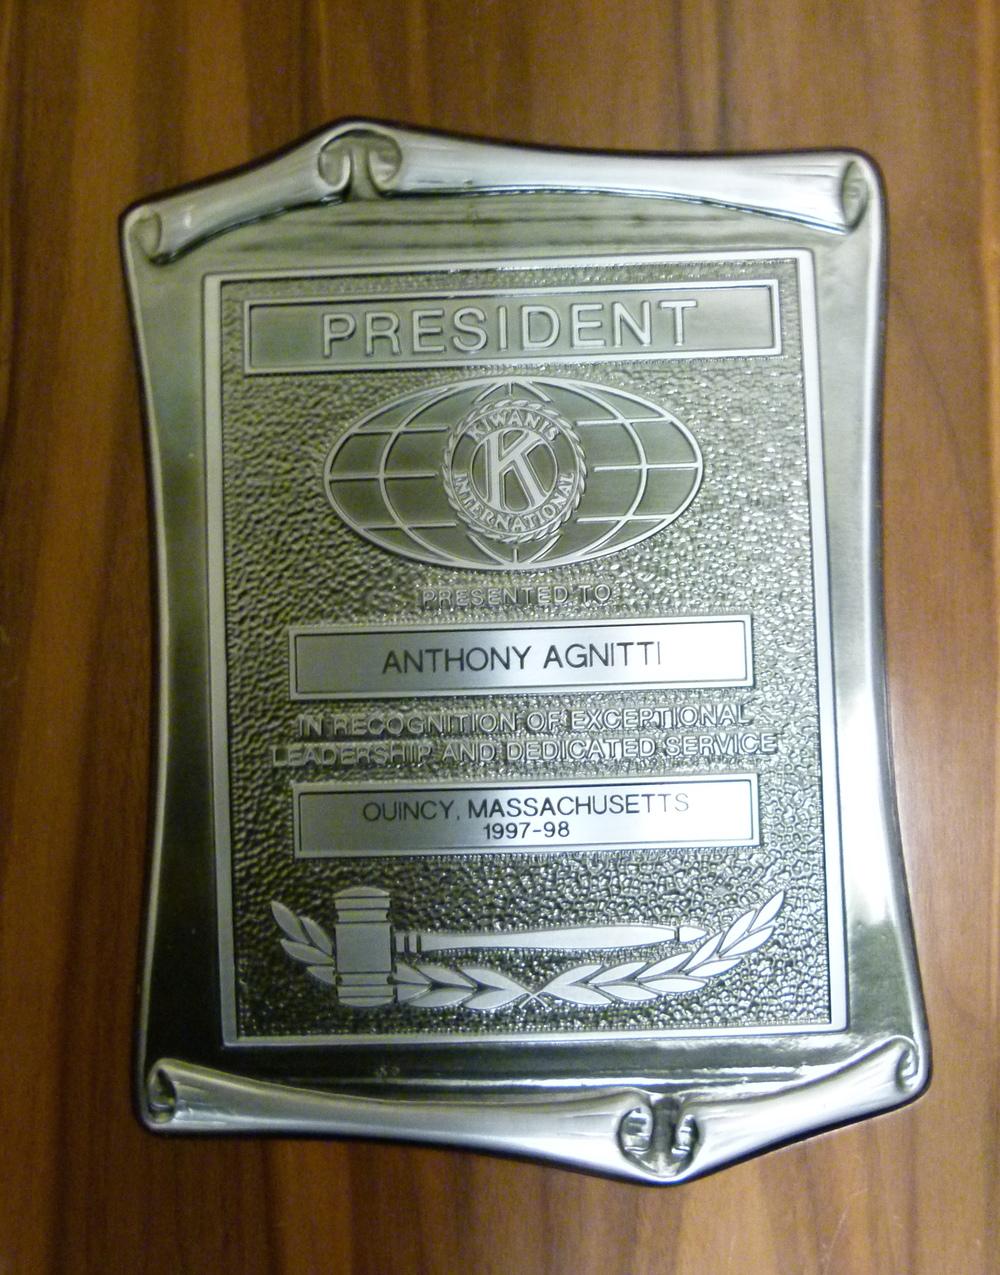 Anthony-Agnitti-president-exceptional-leadership-Kiwanis